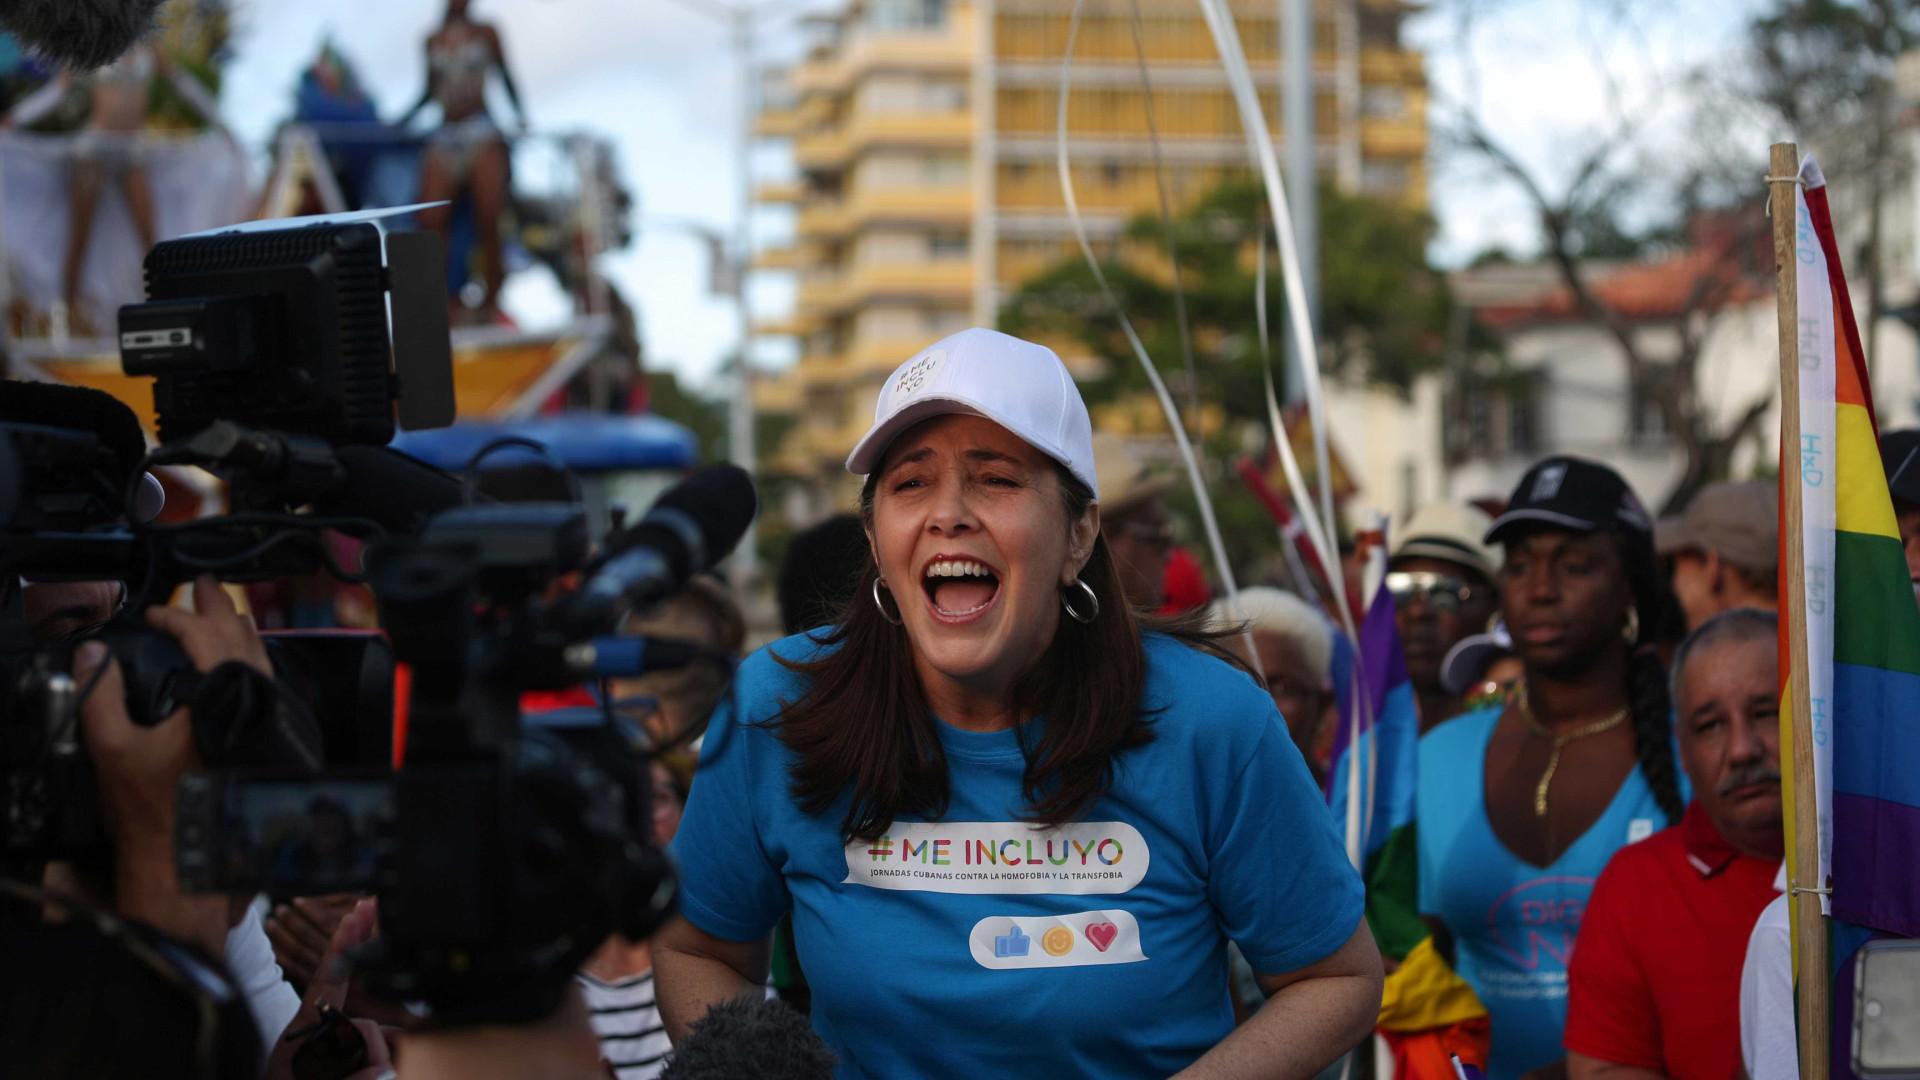 Filha de Raúl Castro lidera marcha contra homofobia em Cuba